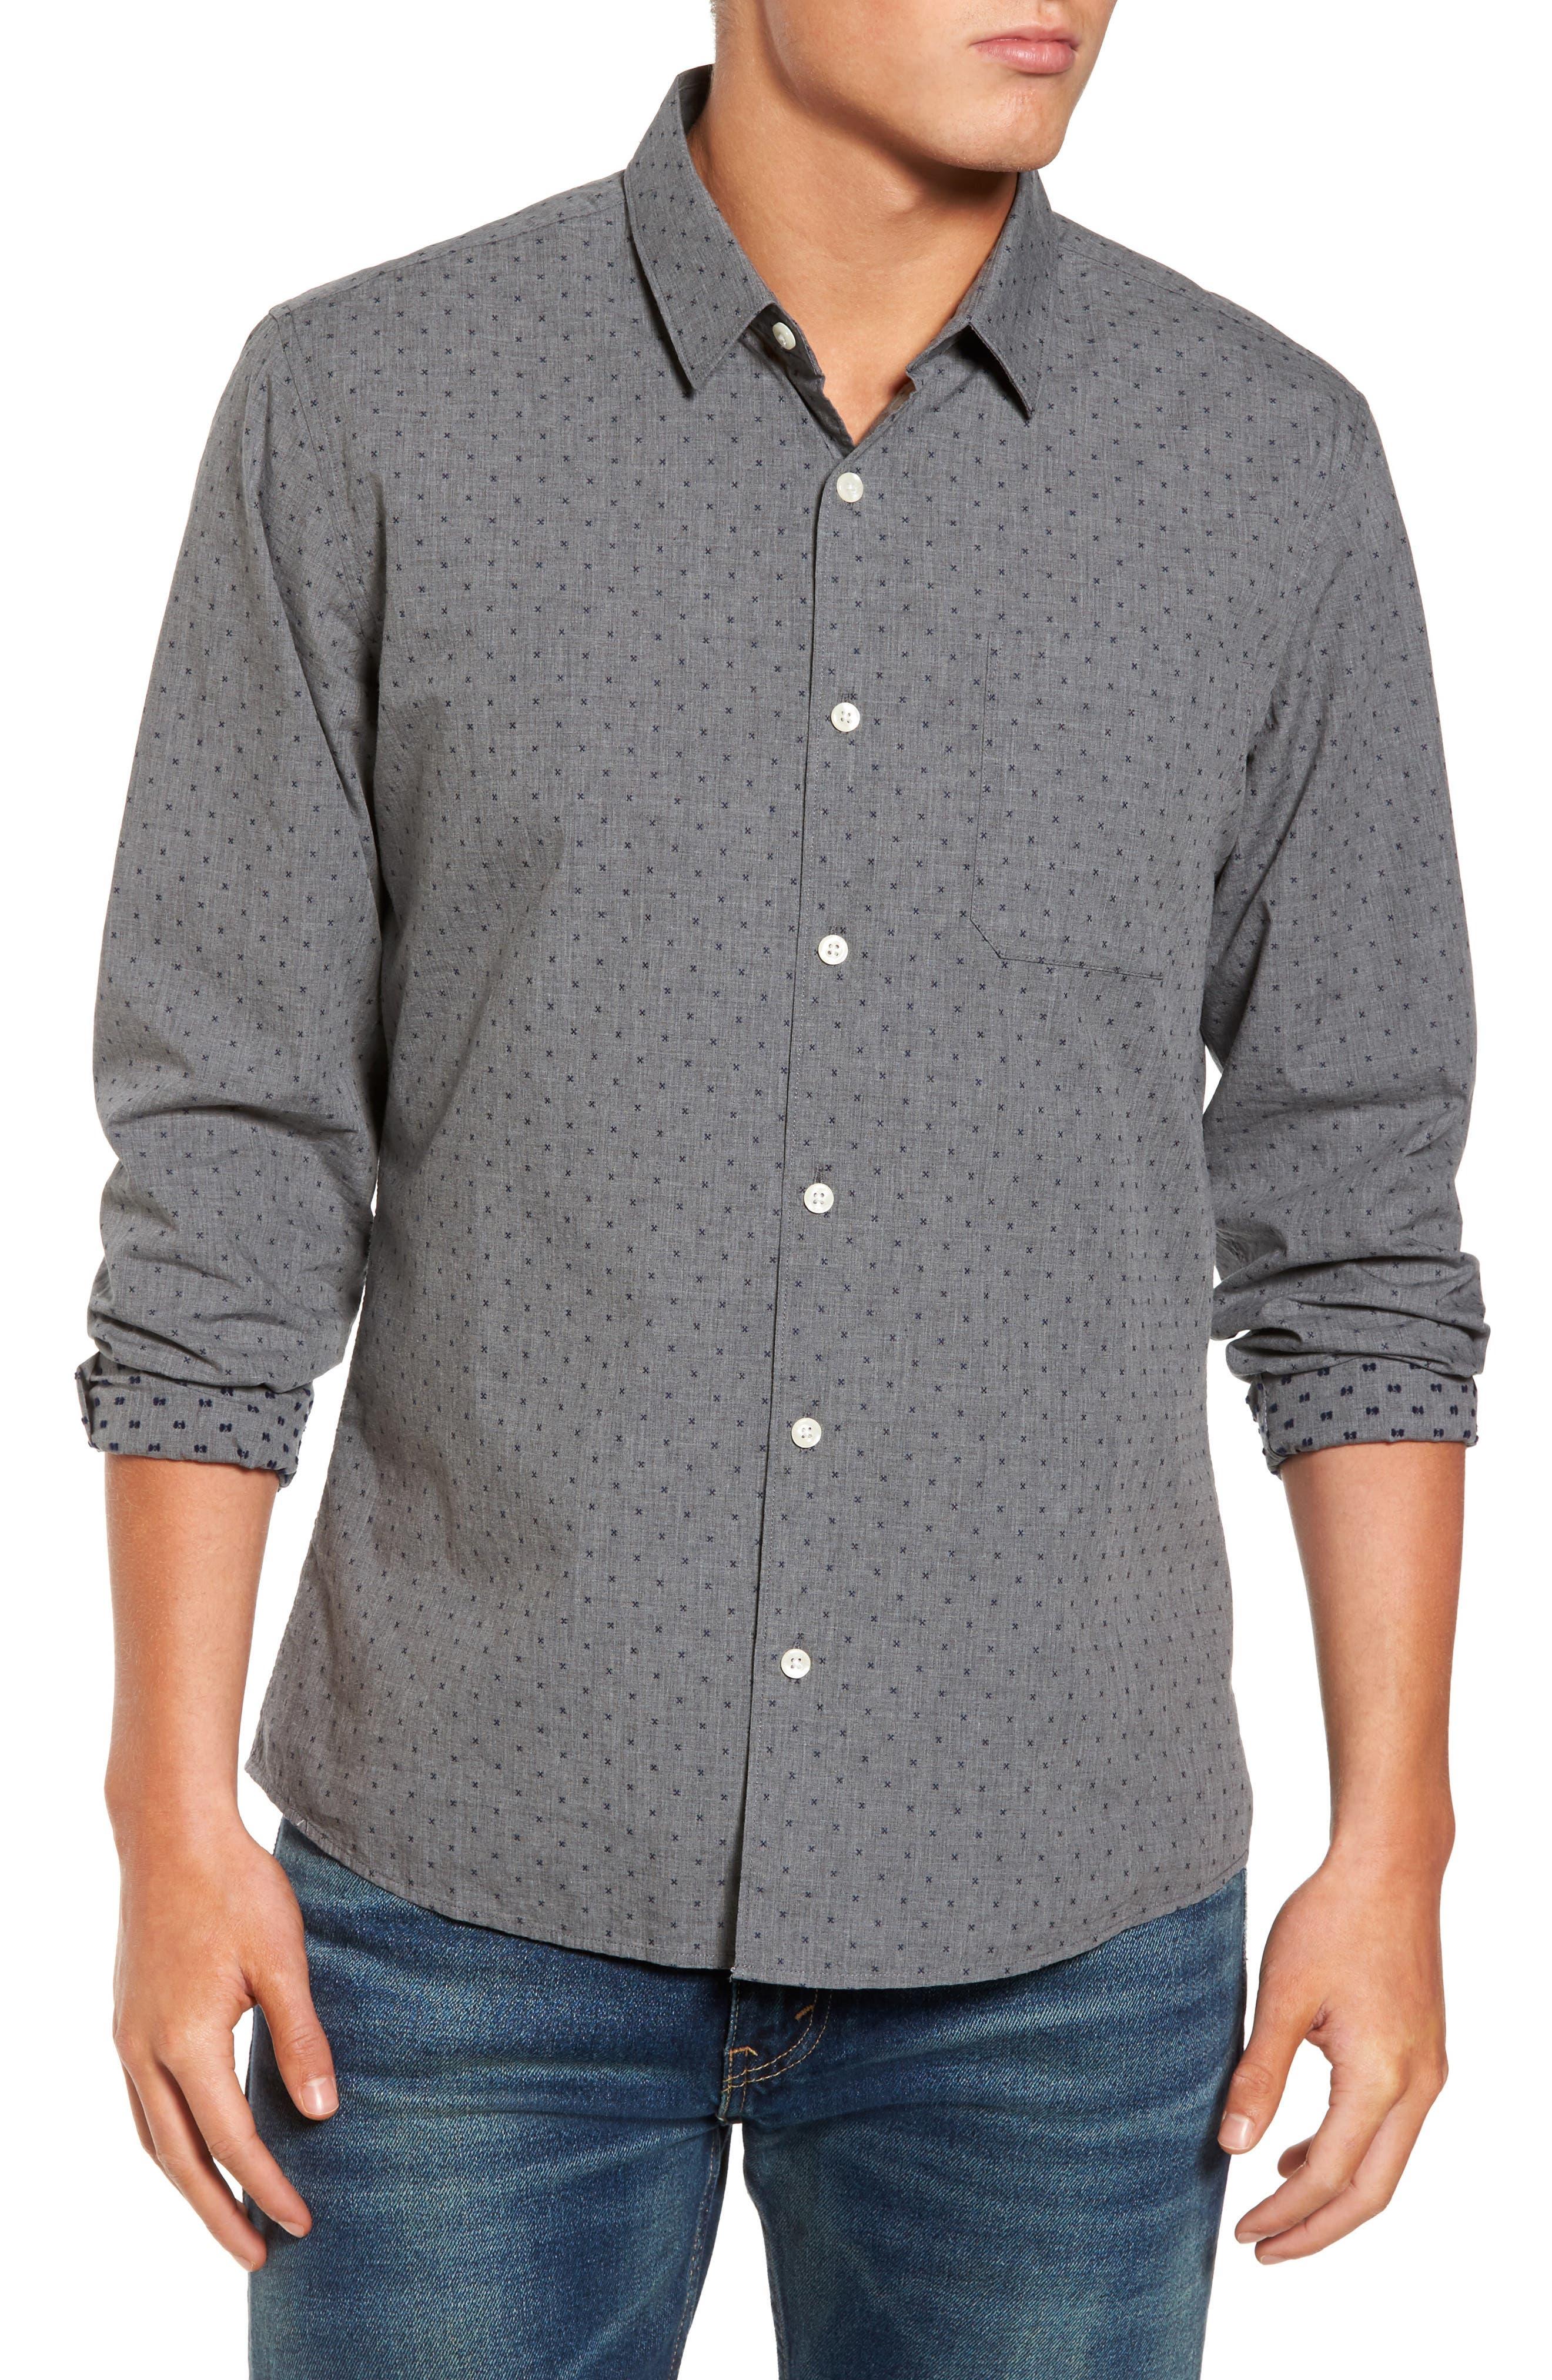 Steel Sky Woven Shirt,                         Main,                         color, Navy